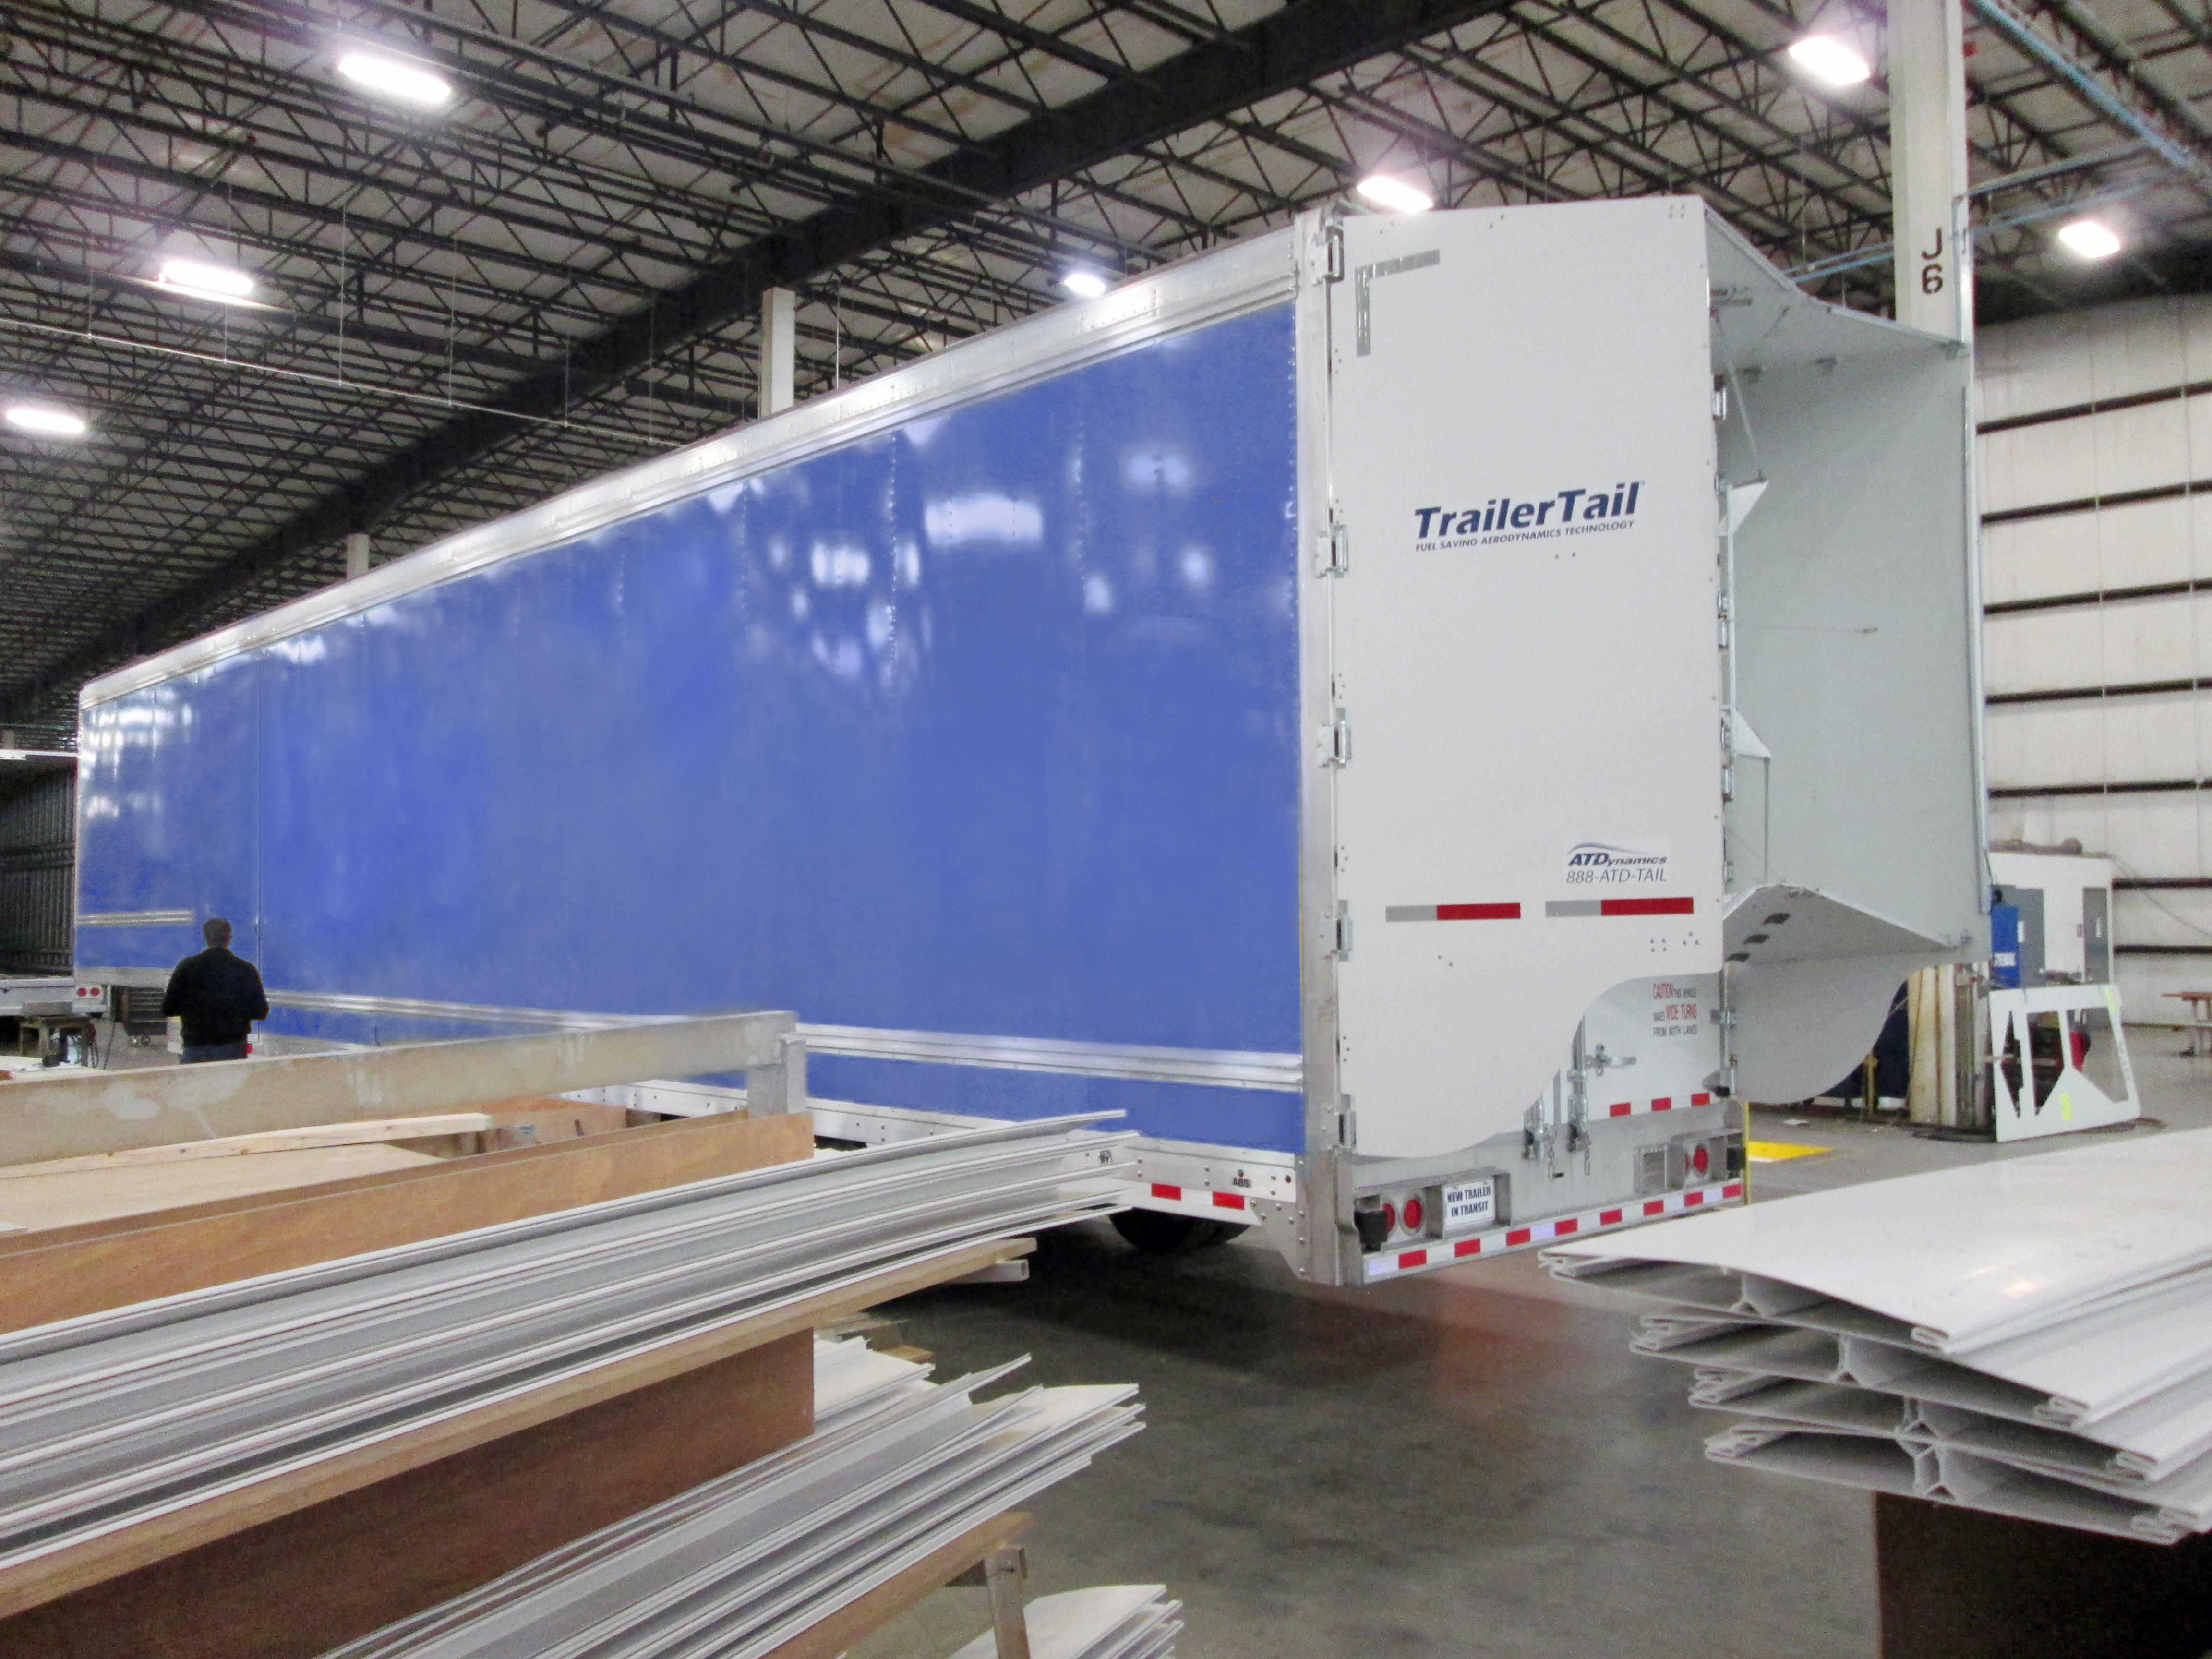 Kentucky Trailer to Offer Trailer Tail DropFrame Aero Fairings